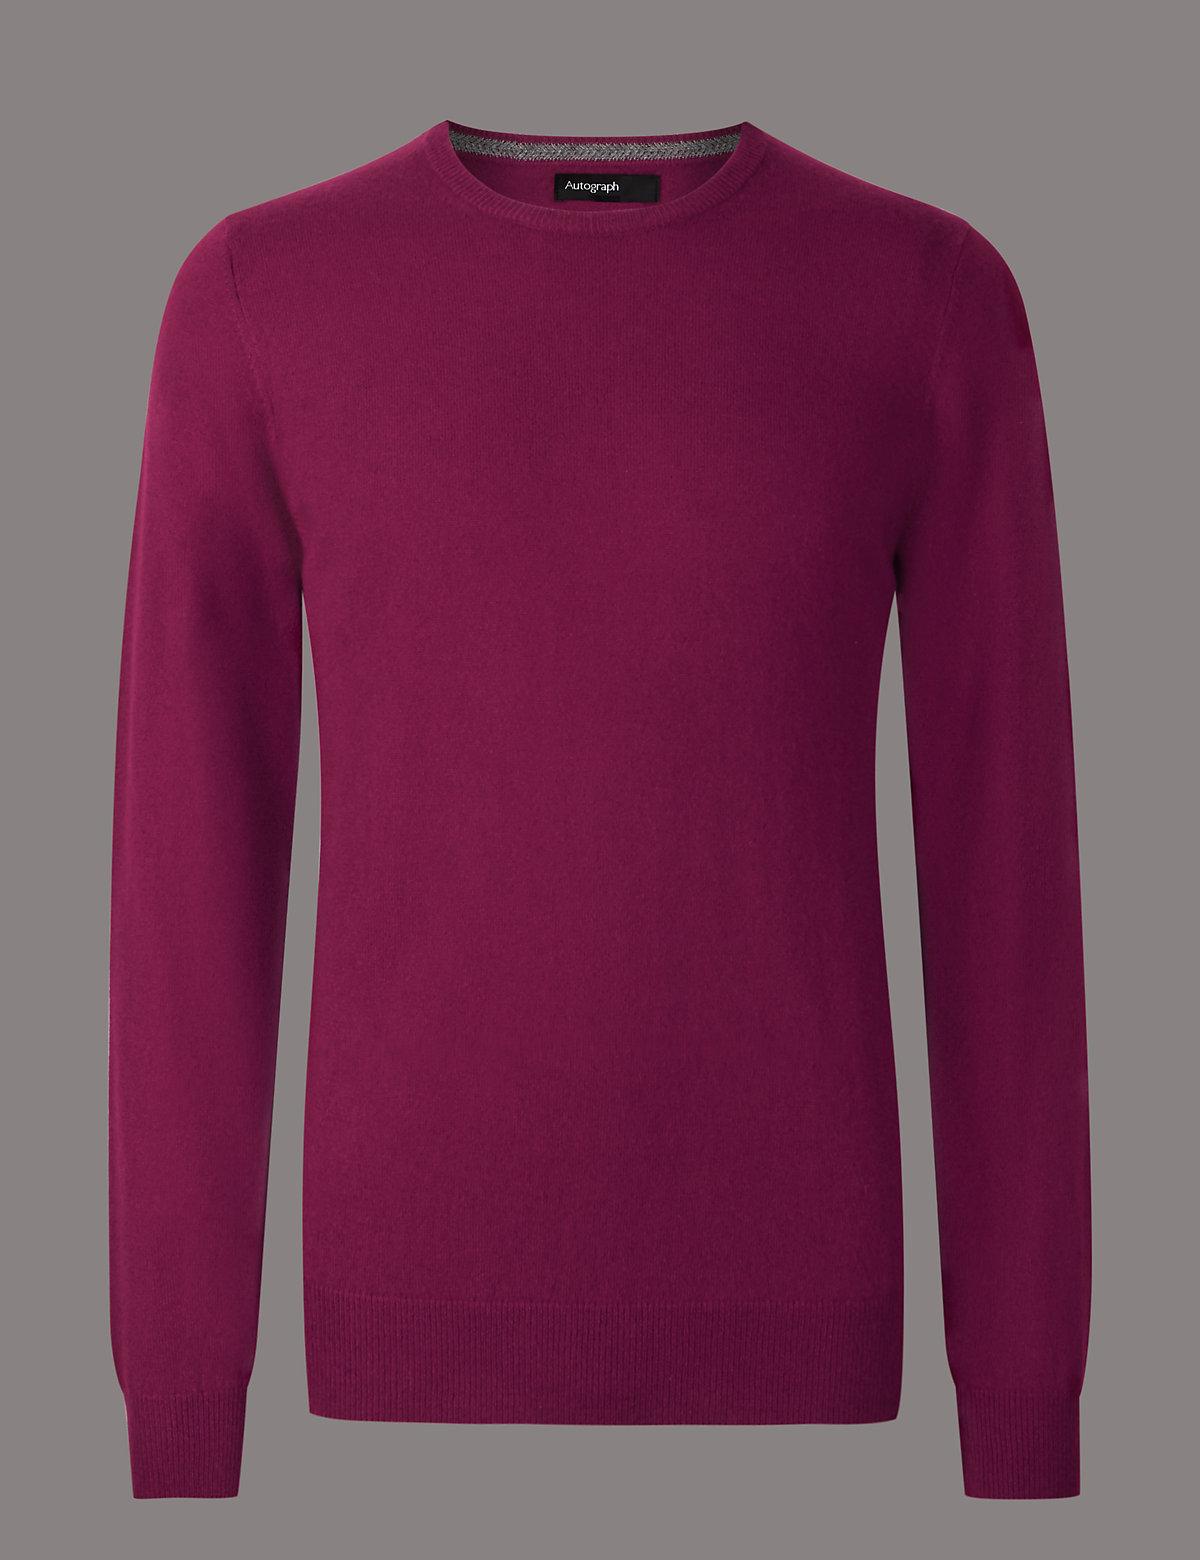 Mens Cashmere, Jumpers & Socks | Knitwear For Men | M&S